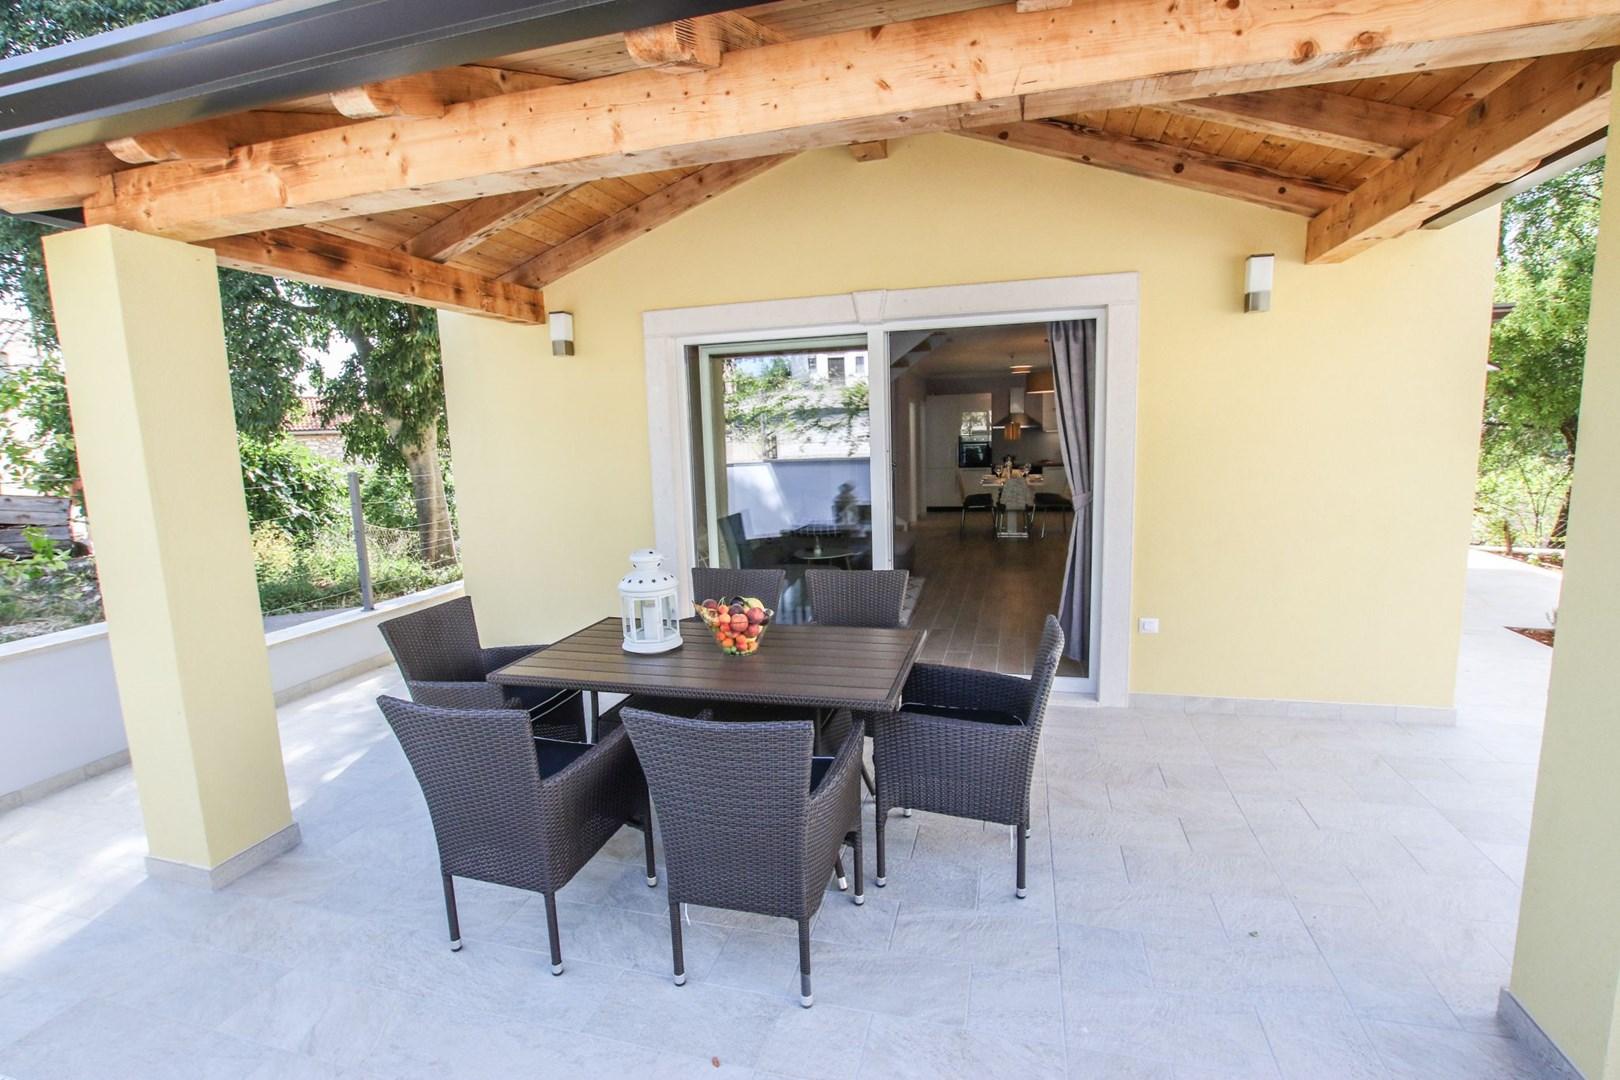 Ferienhaus Villa Albina mit privatem Pool in der Nähe von Aquacolors (2240246), Mugeba, , Istrien, Kroatien, Bild 3